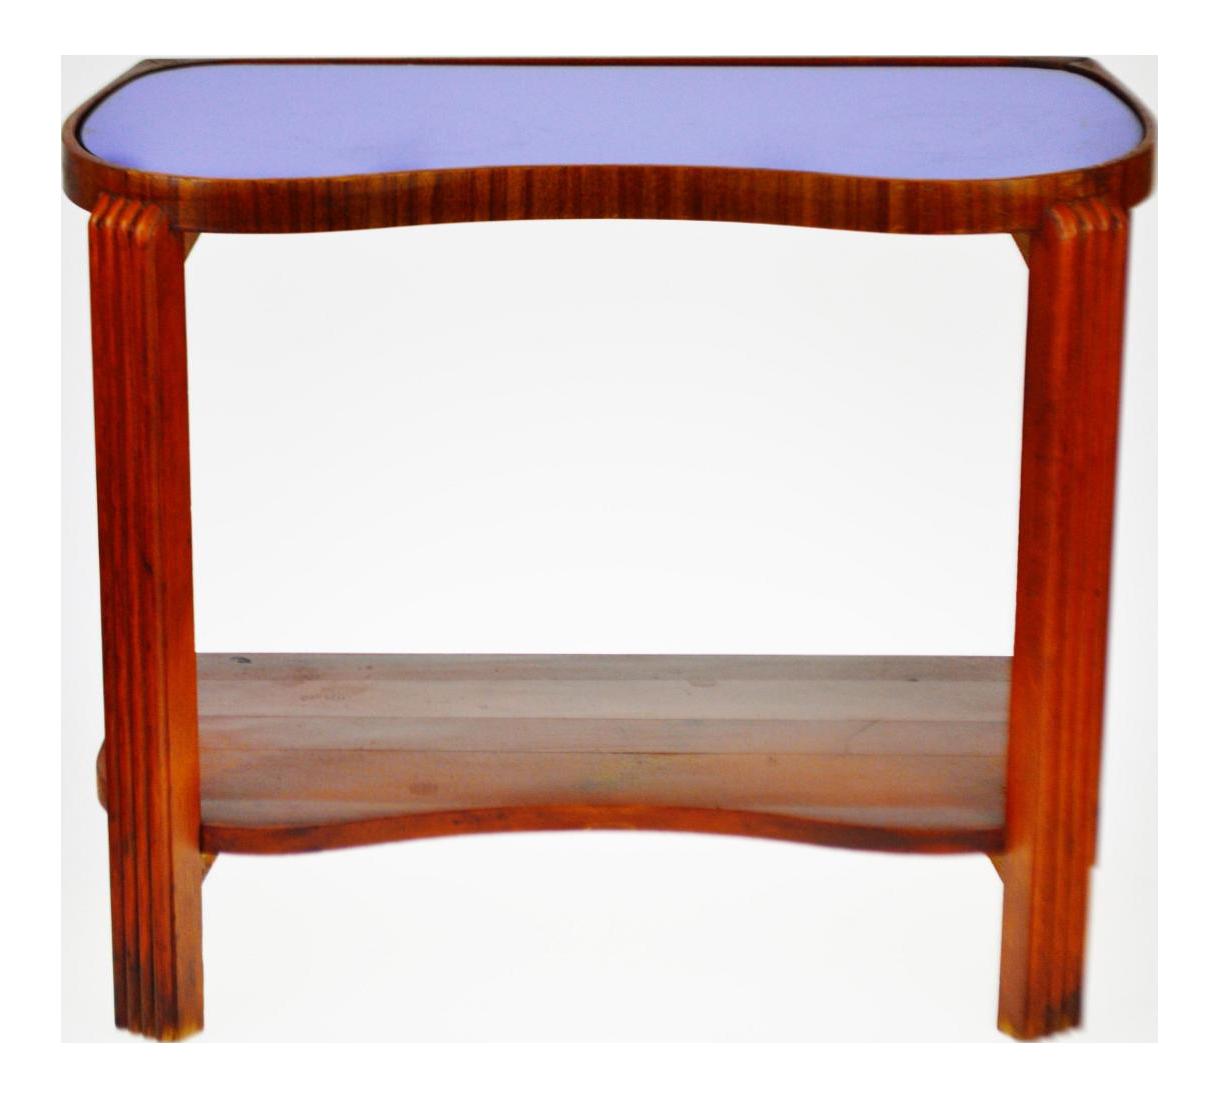 art deco outdoor furniture. vintage art deco cobalt blue mirrored glass table outdoor furniture